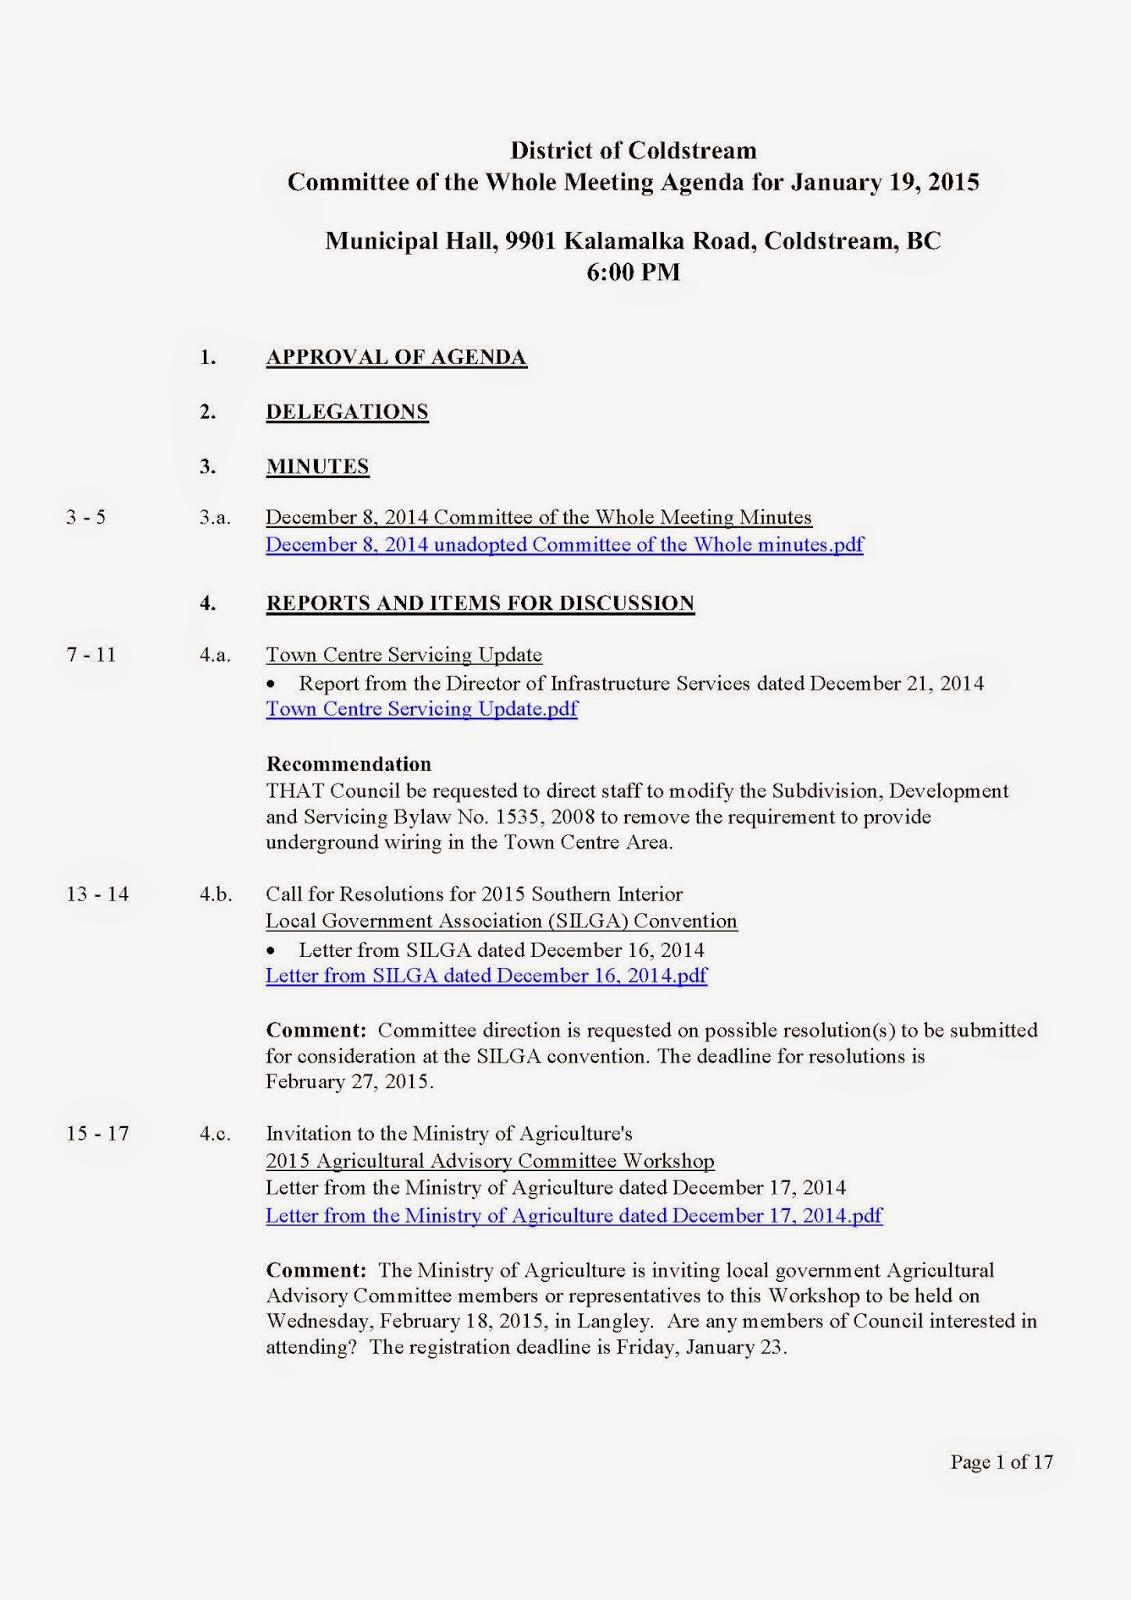 http://coldstream.civicweb.net/Documents/DocumentList.aspx?ID=19560